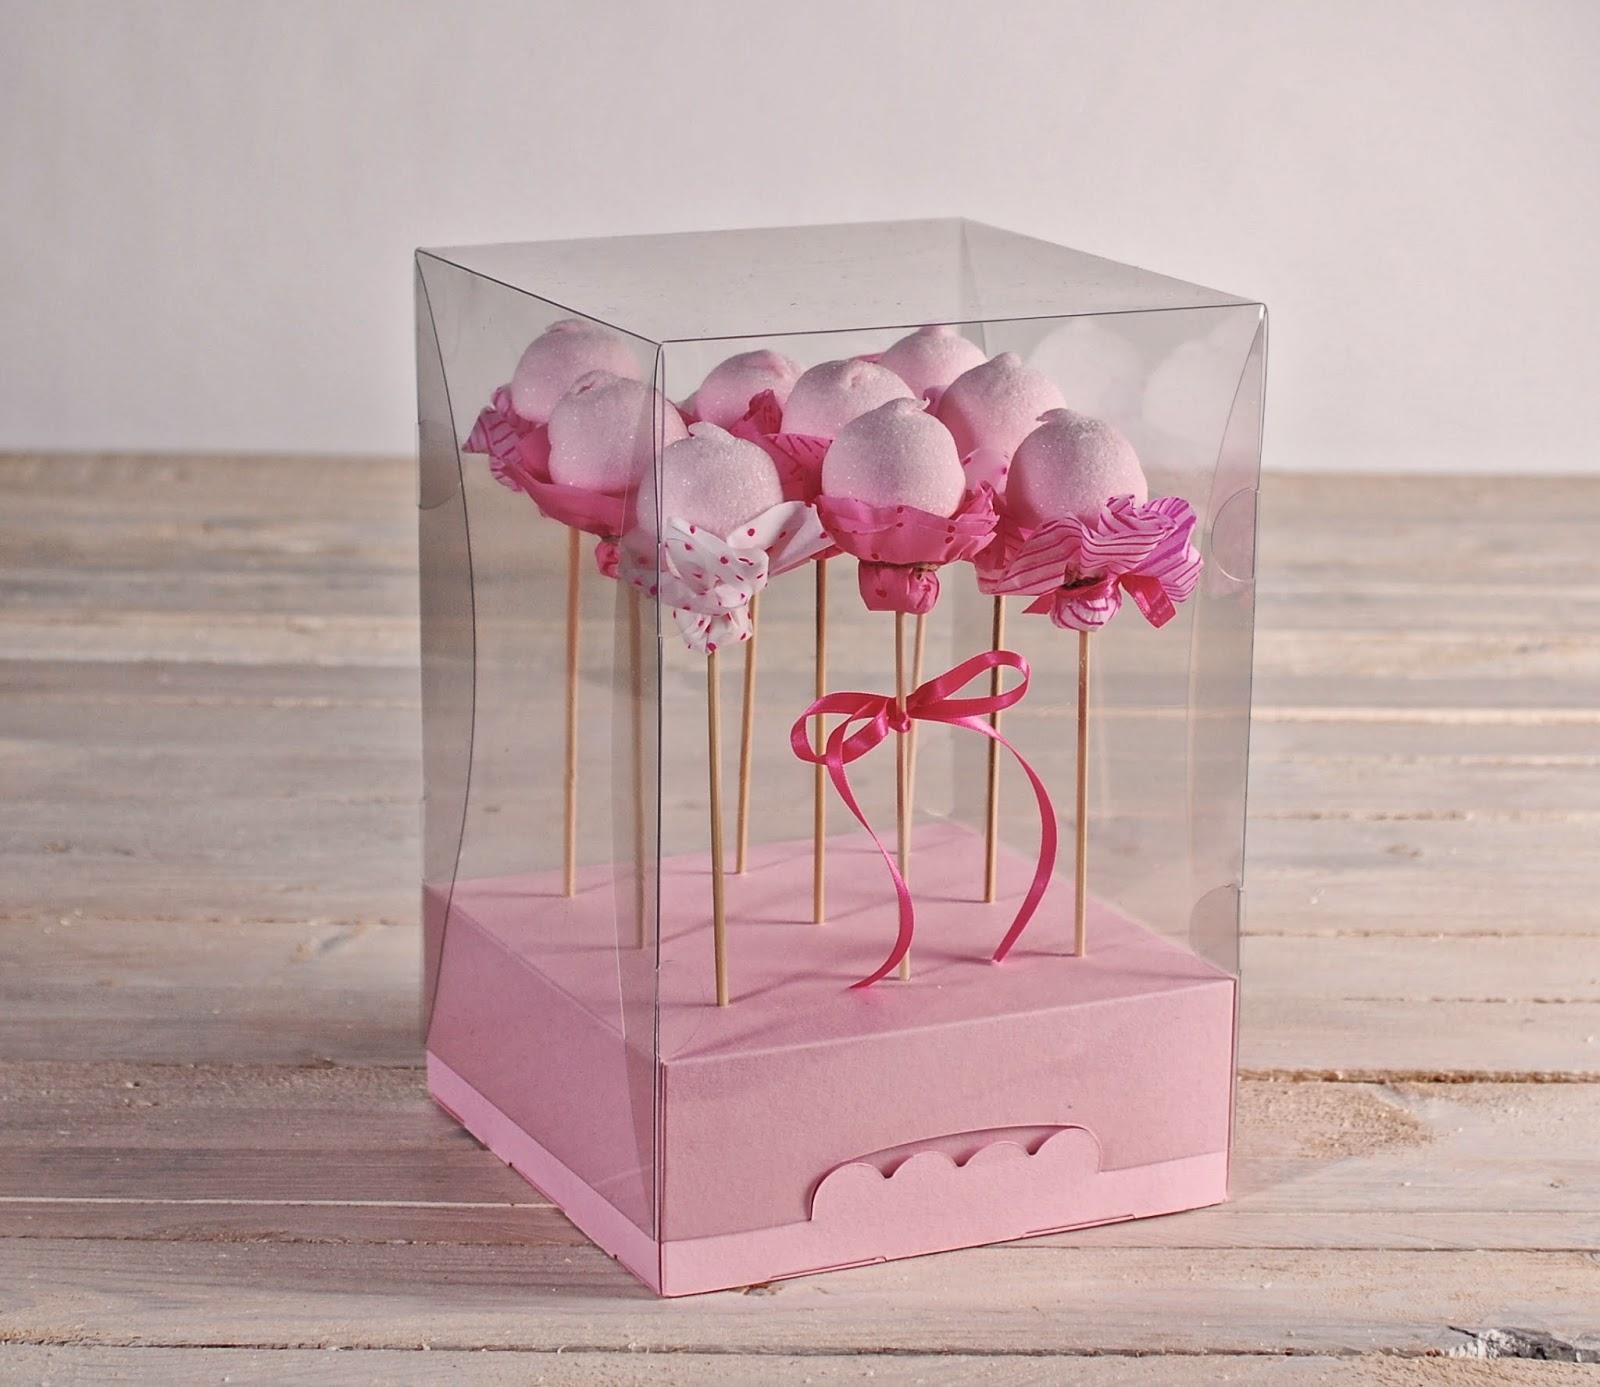 cajas transparentes, cajas repostería, cajas para cake pops, cajas cake pops, cajas originales